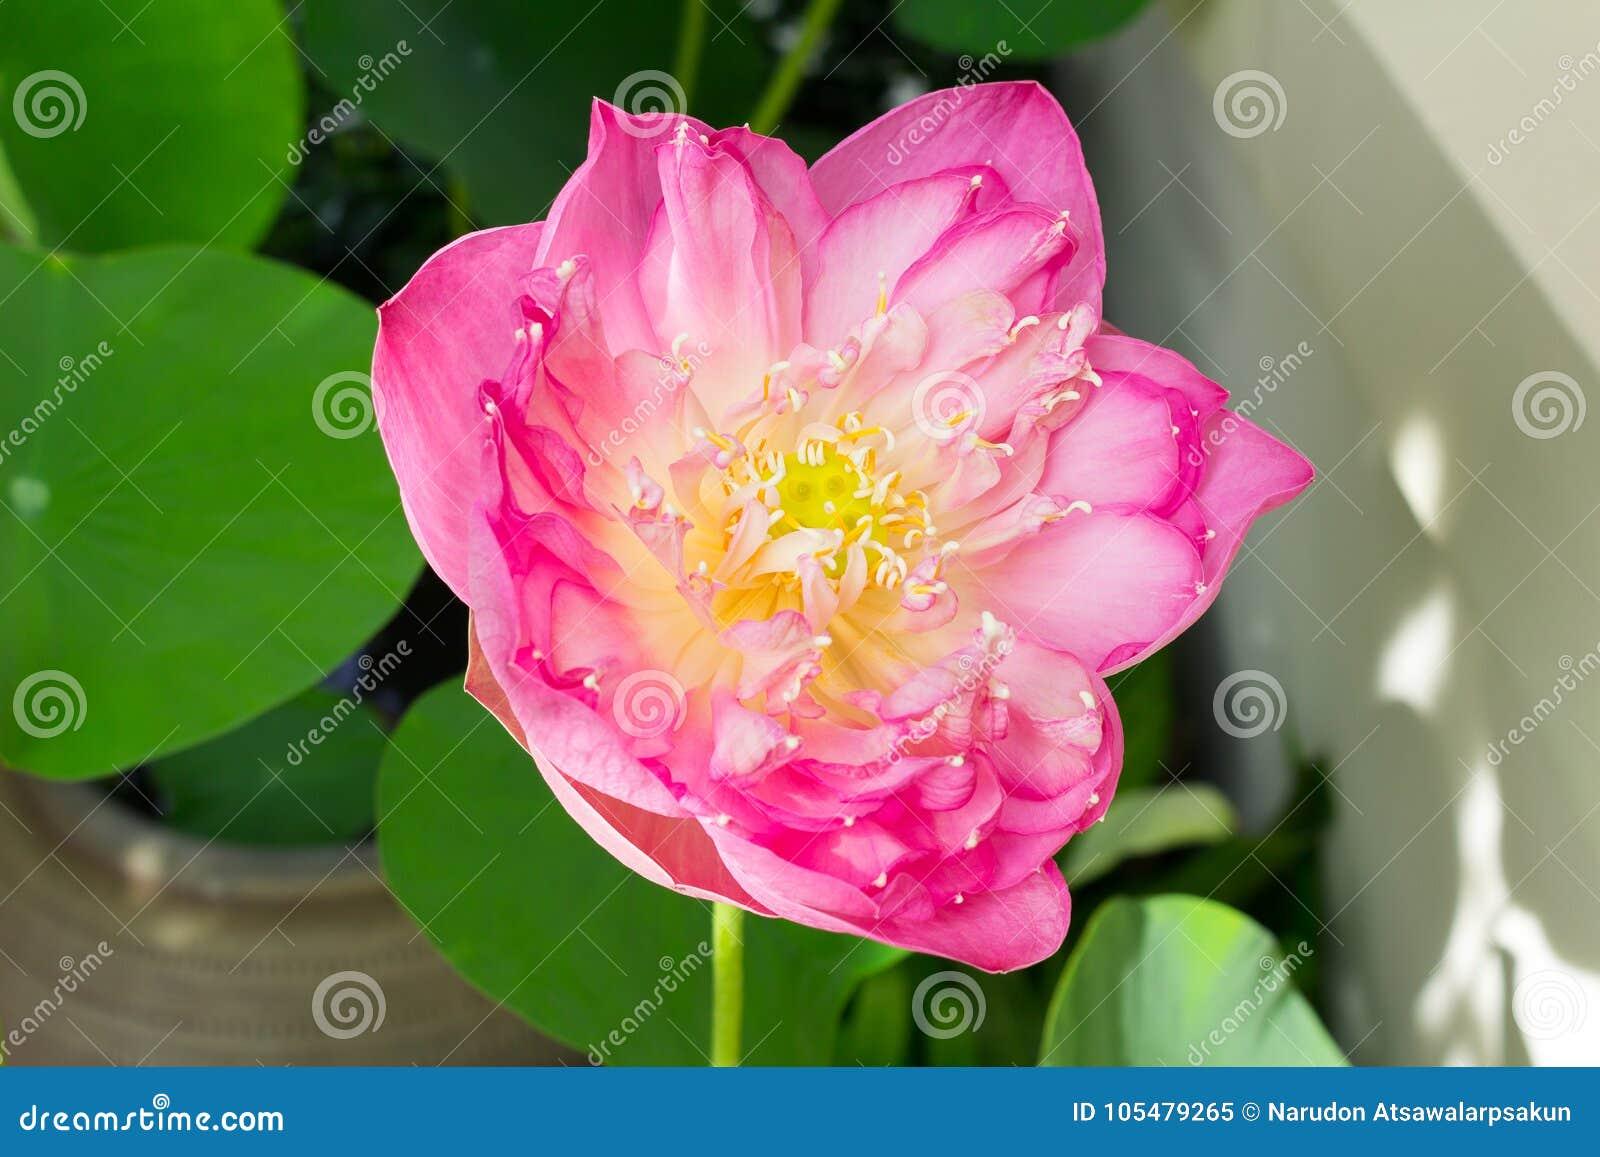 Lotus flower in full bloom symbolizing religion buddhism puri download lotus flower in full bloom symbolizing religion buddhism puri stock image mightylinksfo